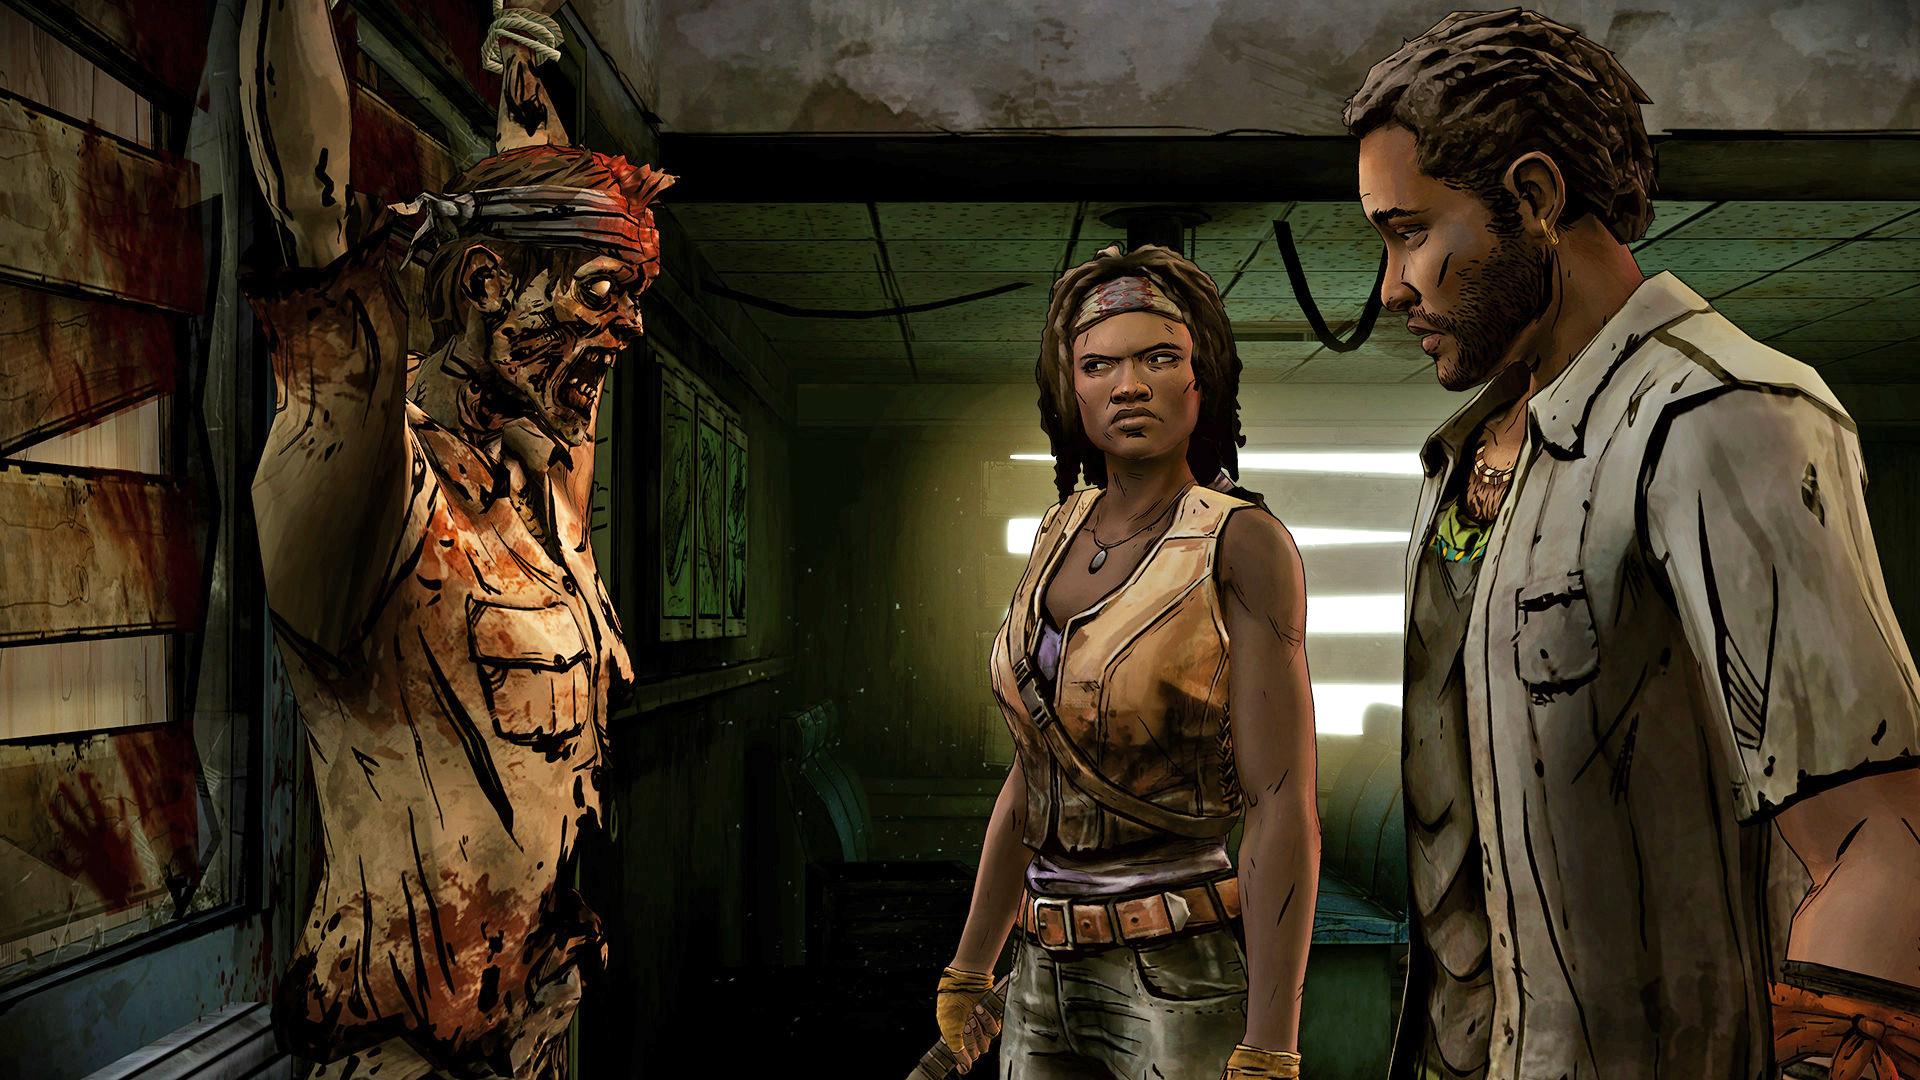 'The Walking Dead: Michonne' debuts on February 23rd